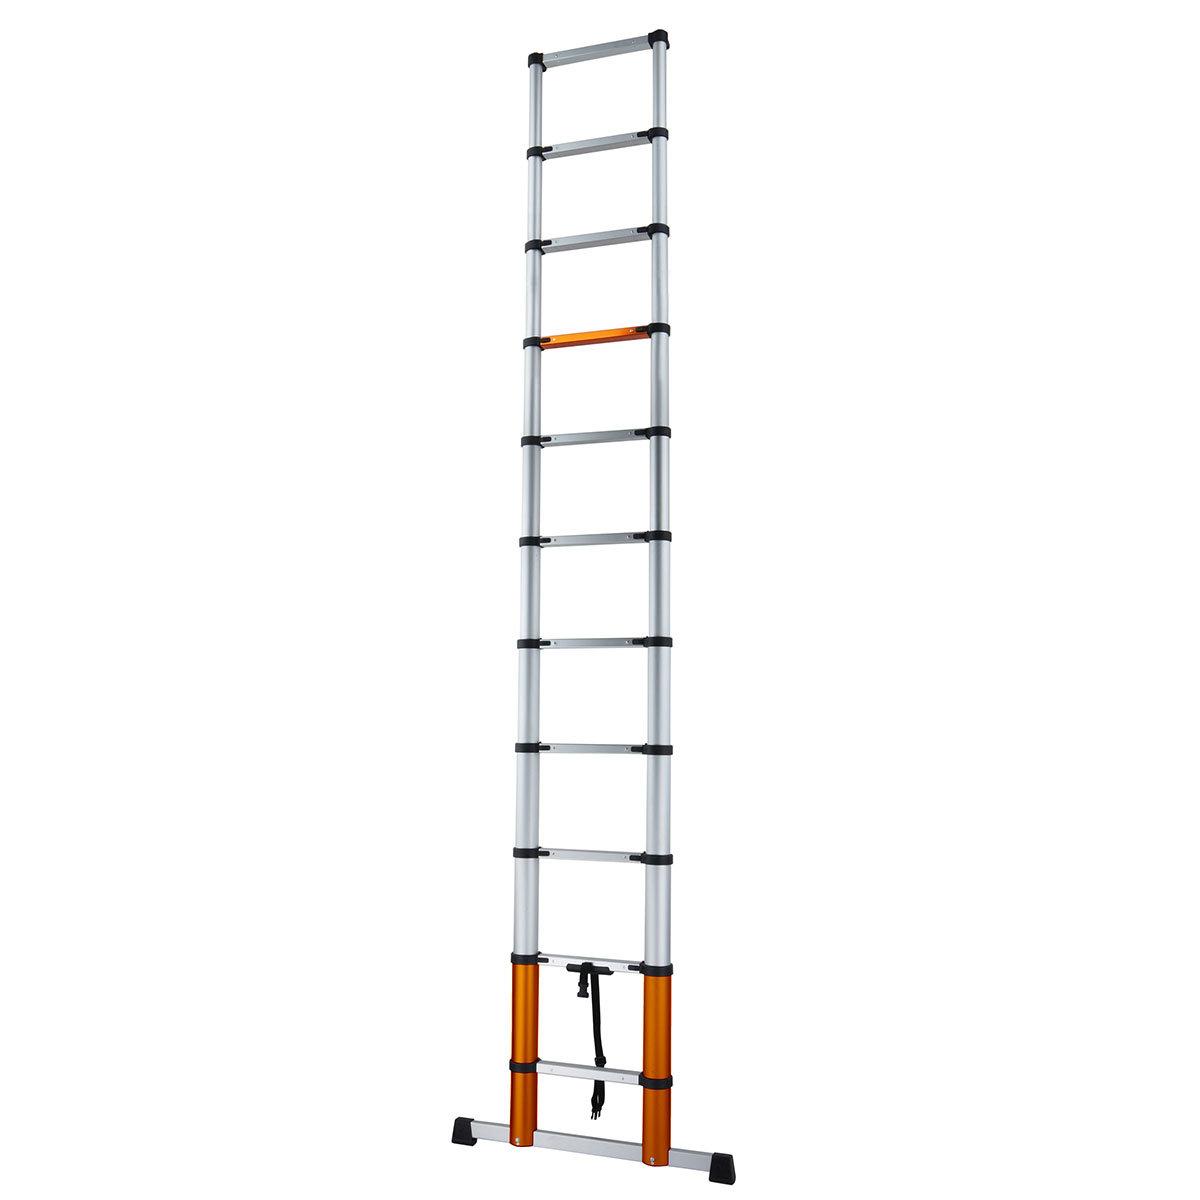 Teleskopleiter Giraffe Air 3,27 m mit Stand- & Quertraverse | #3